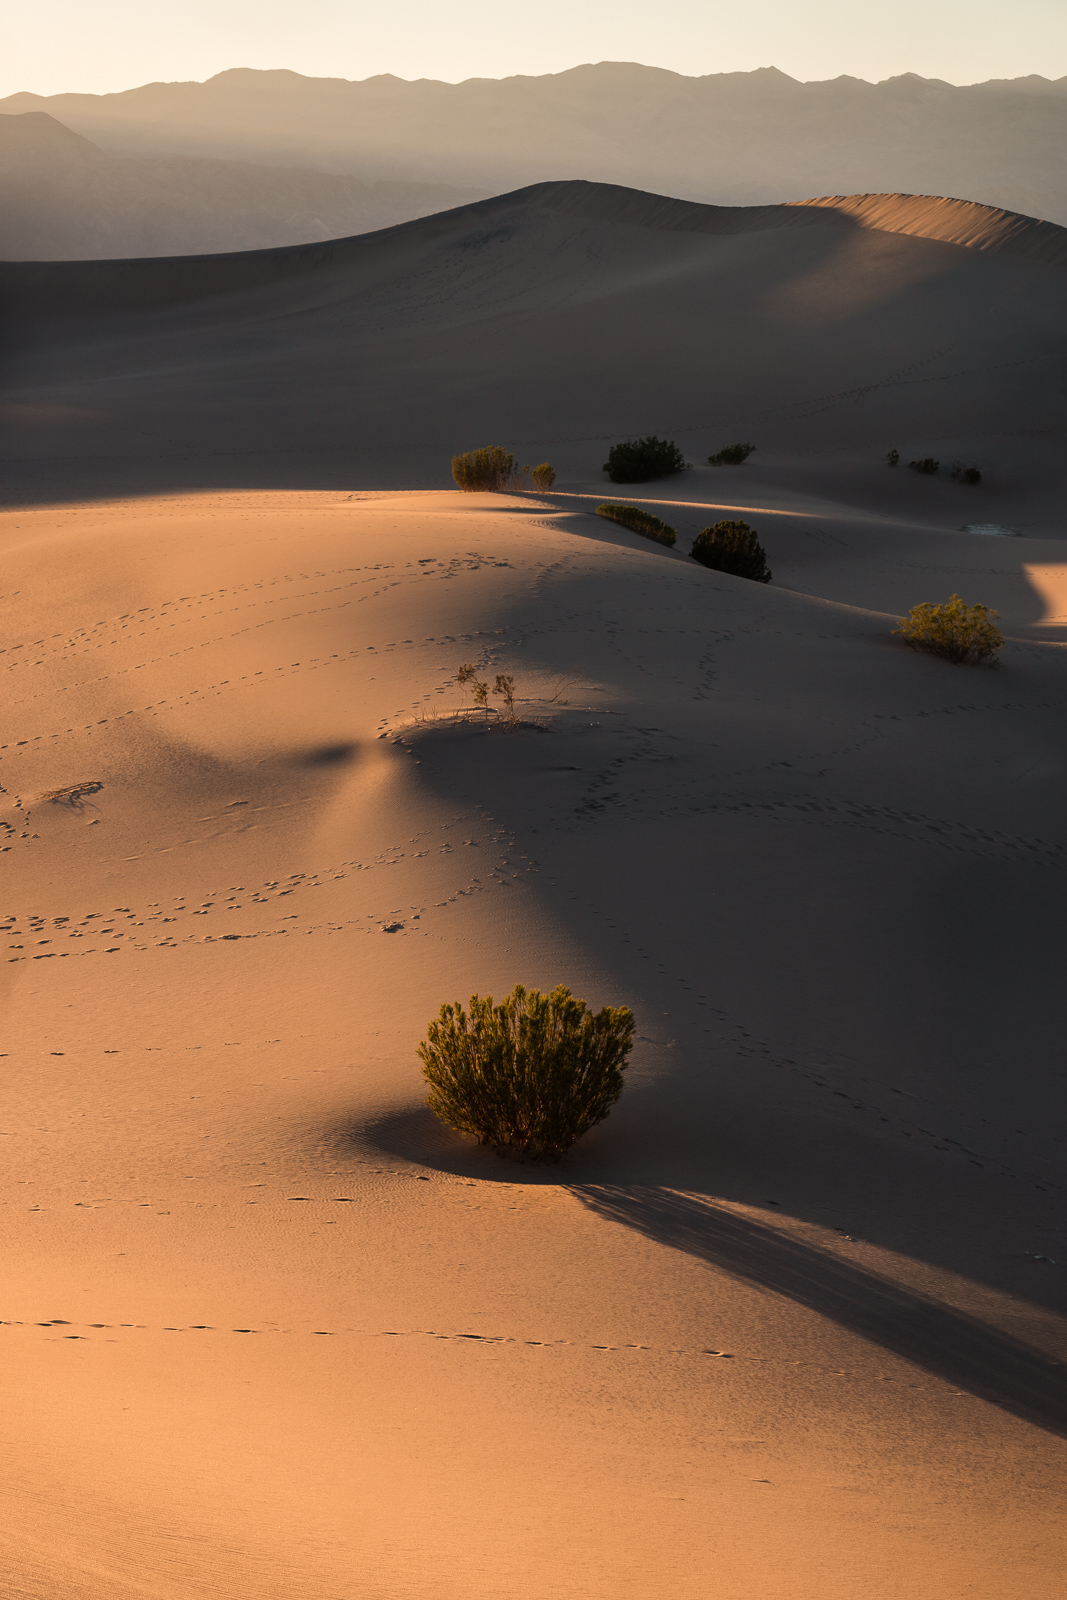 13_Death-Valley-dunes-landscape_Joseph-Barber-Studios.jpg